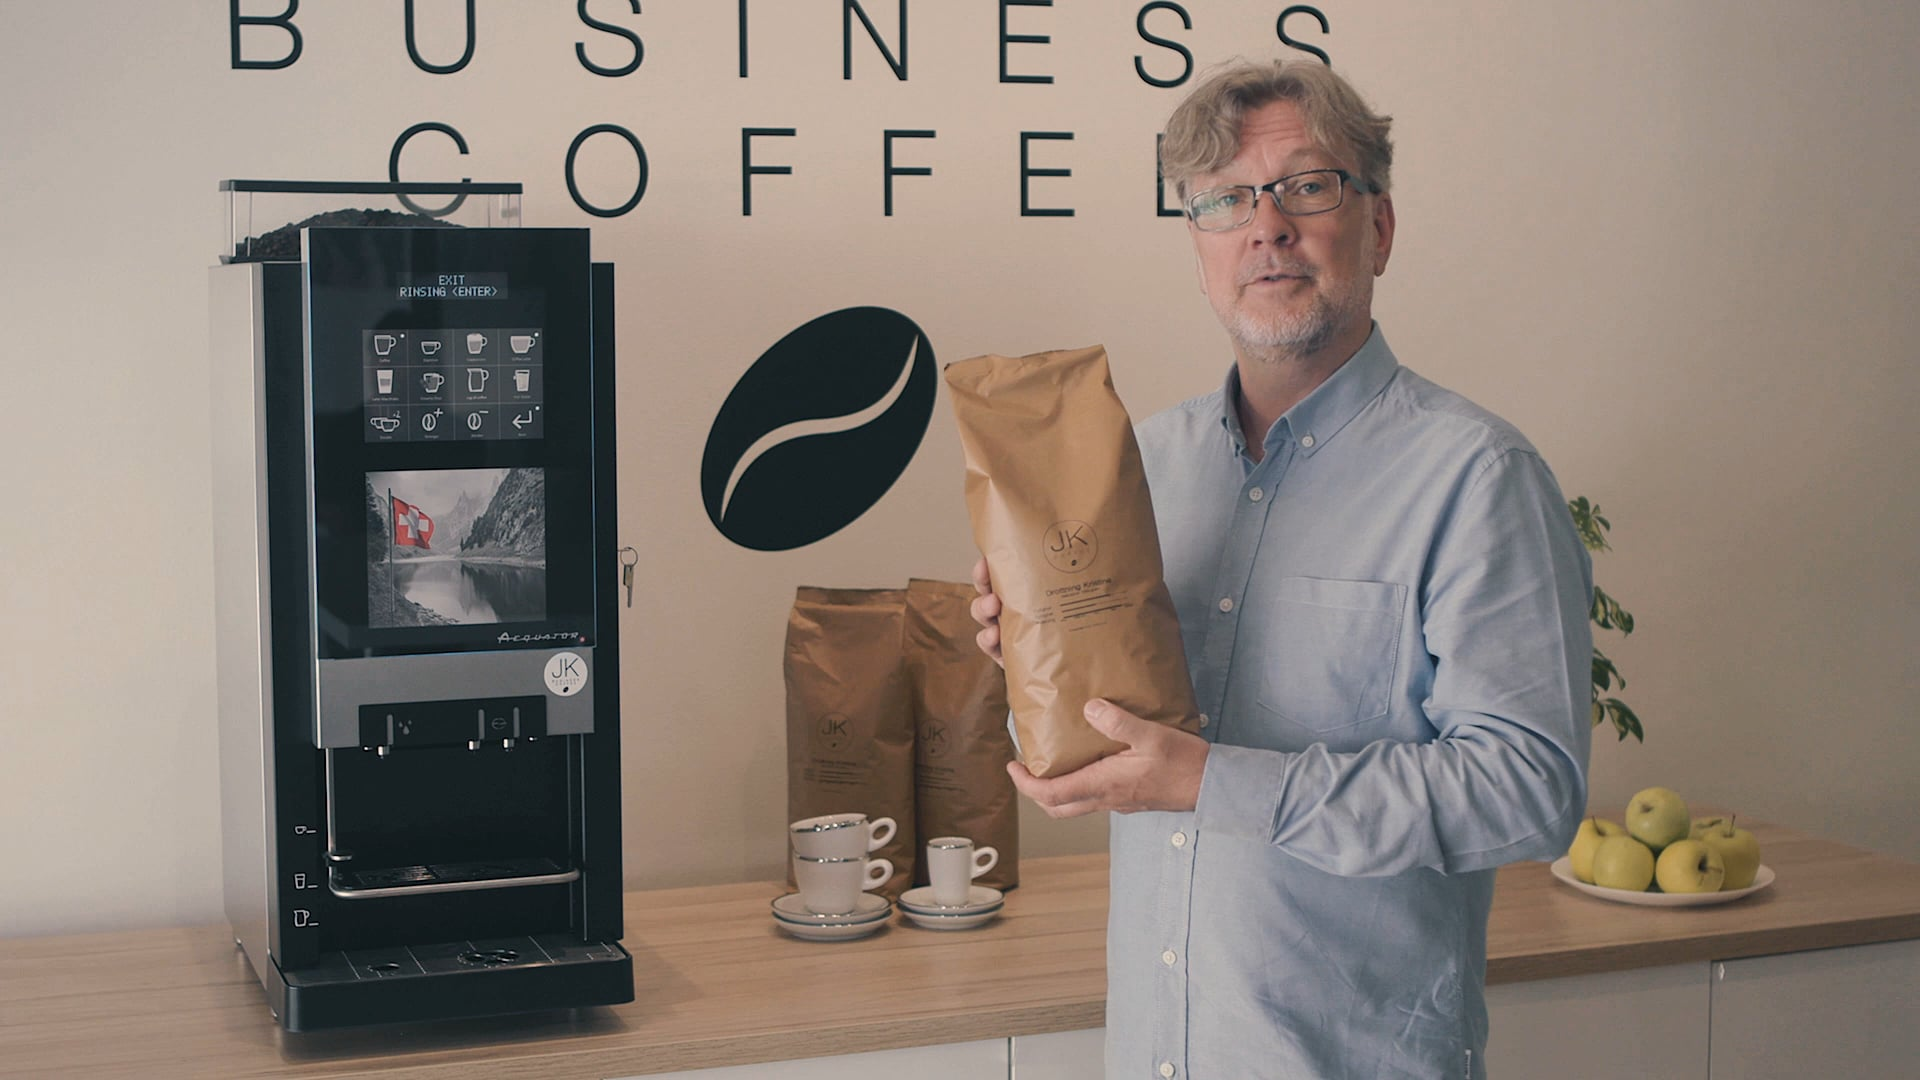 JK Business Coffee